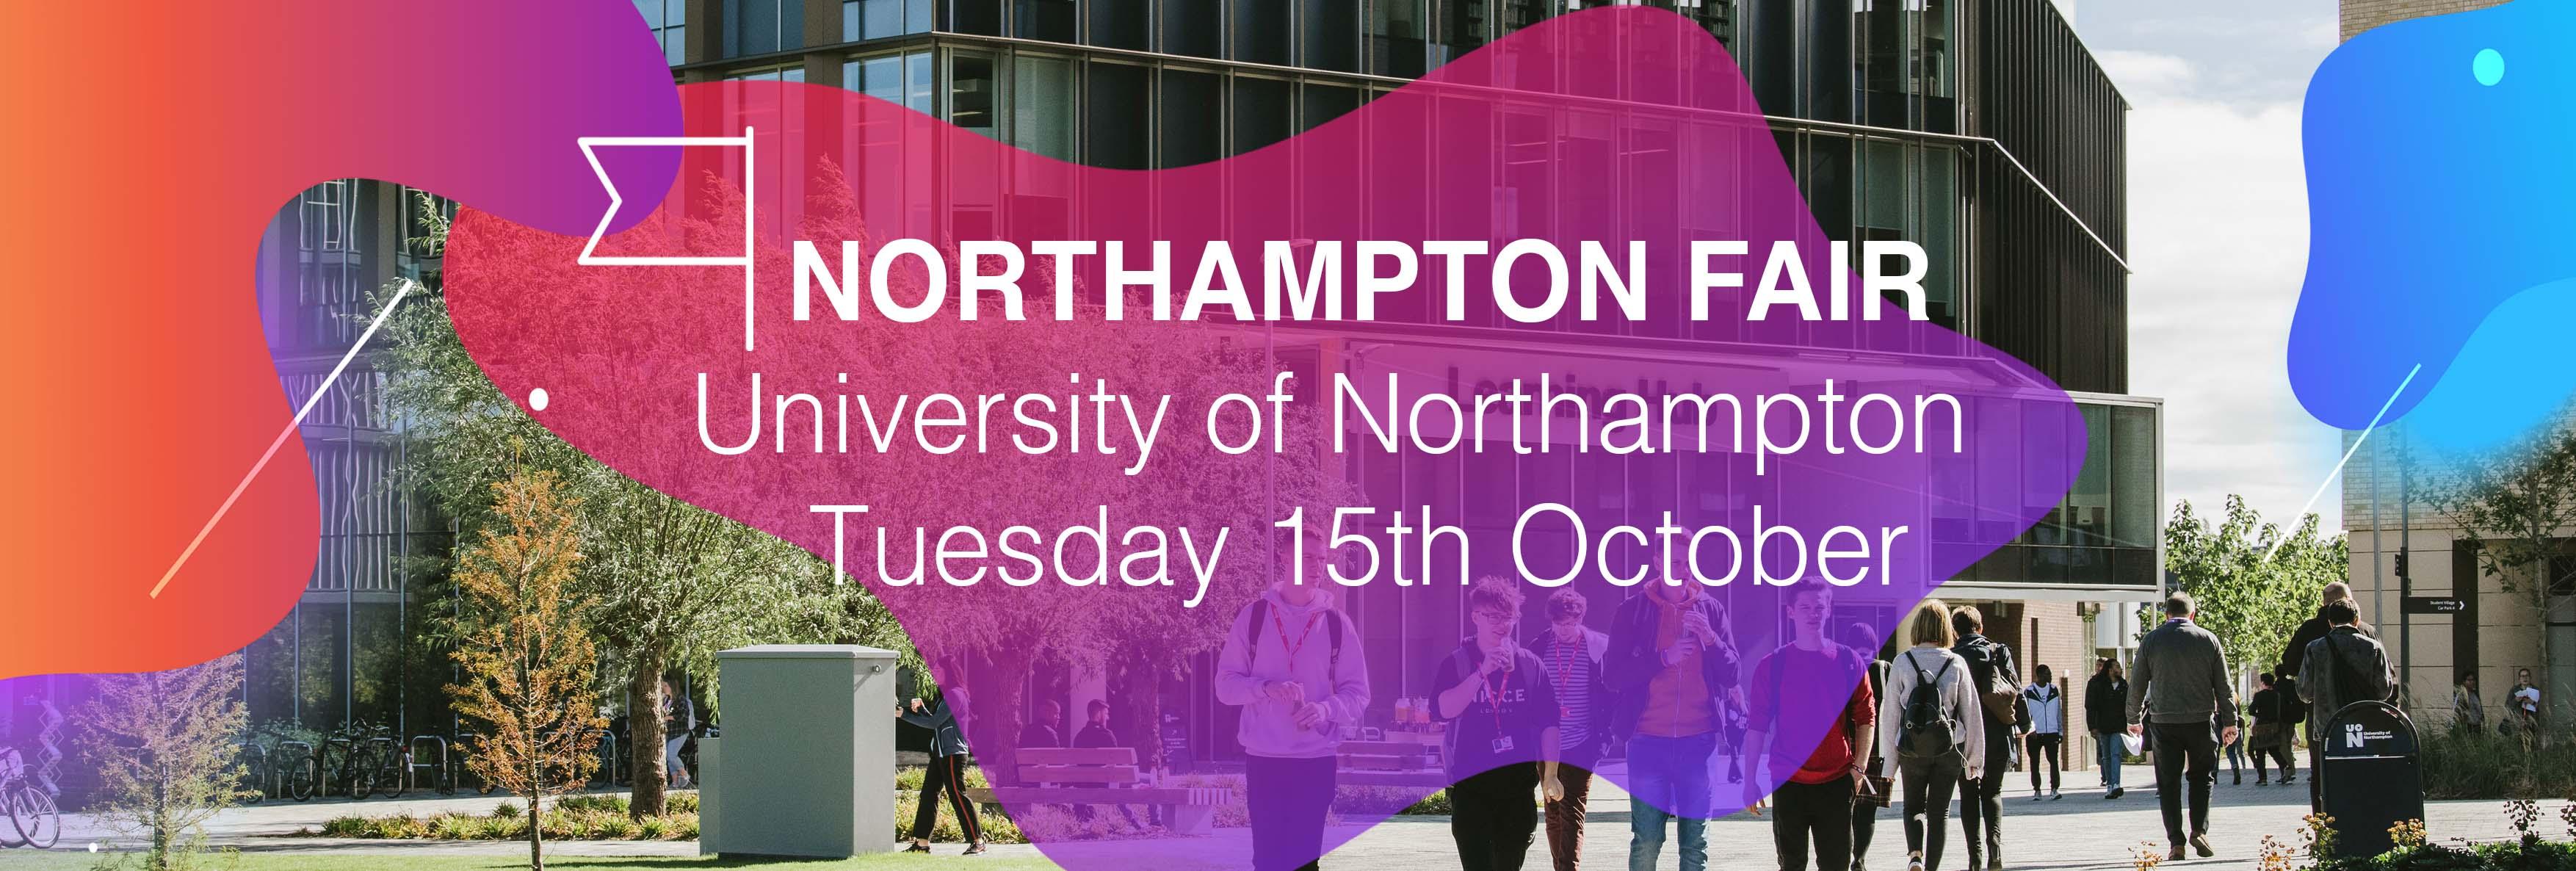 Northampton Autumn 2019 Fair